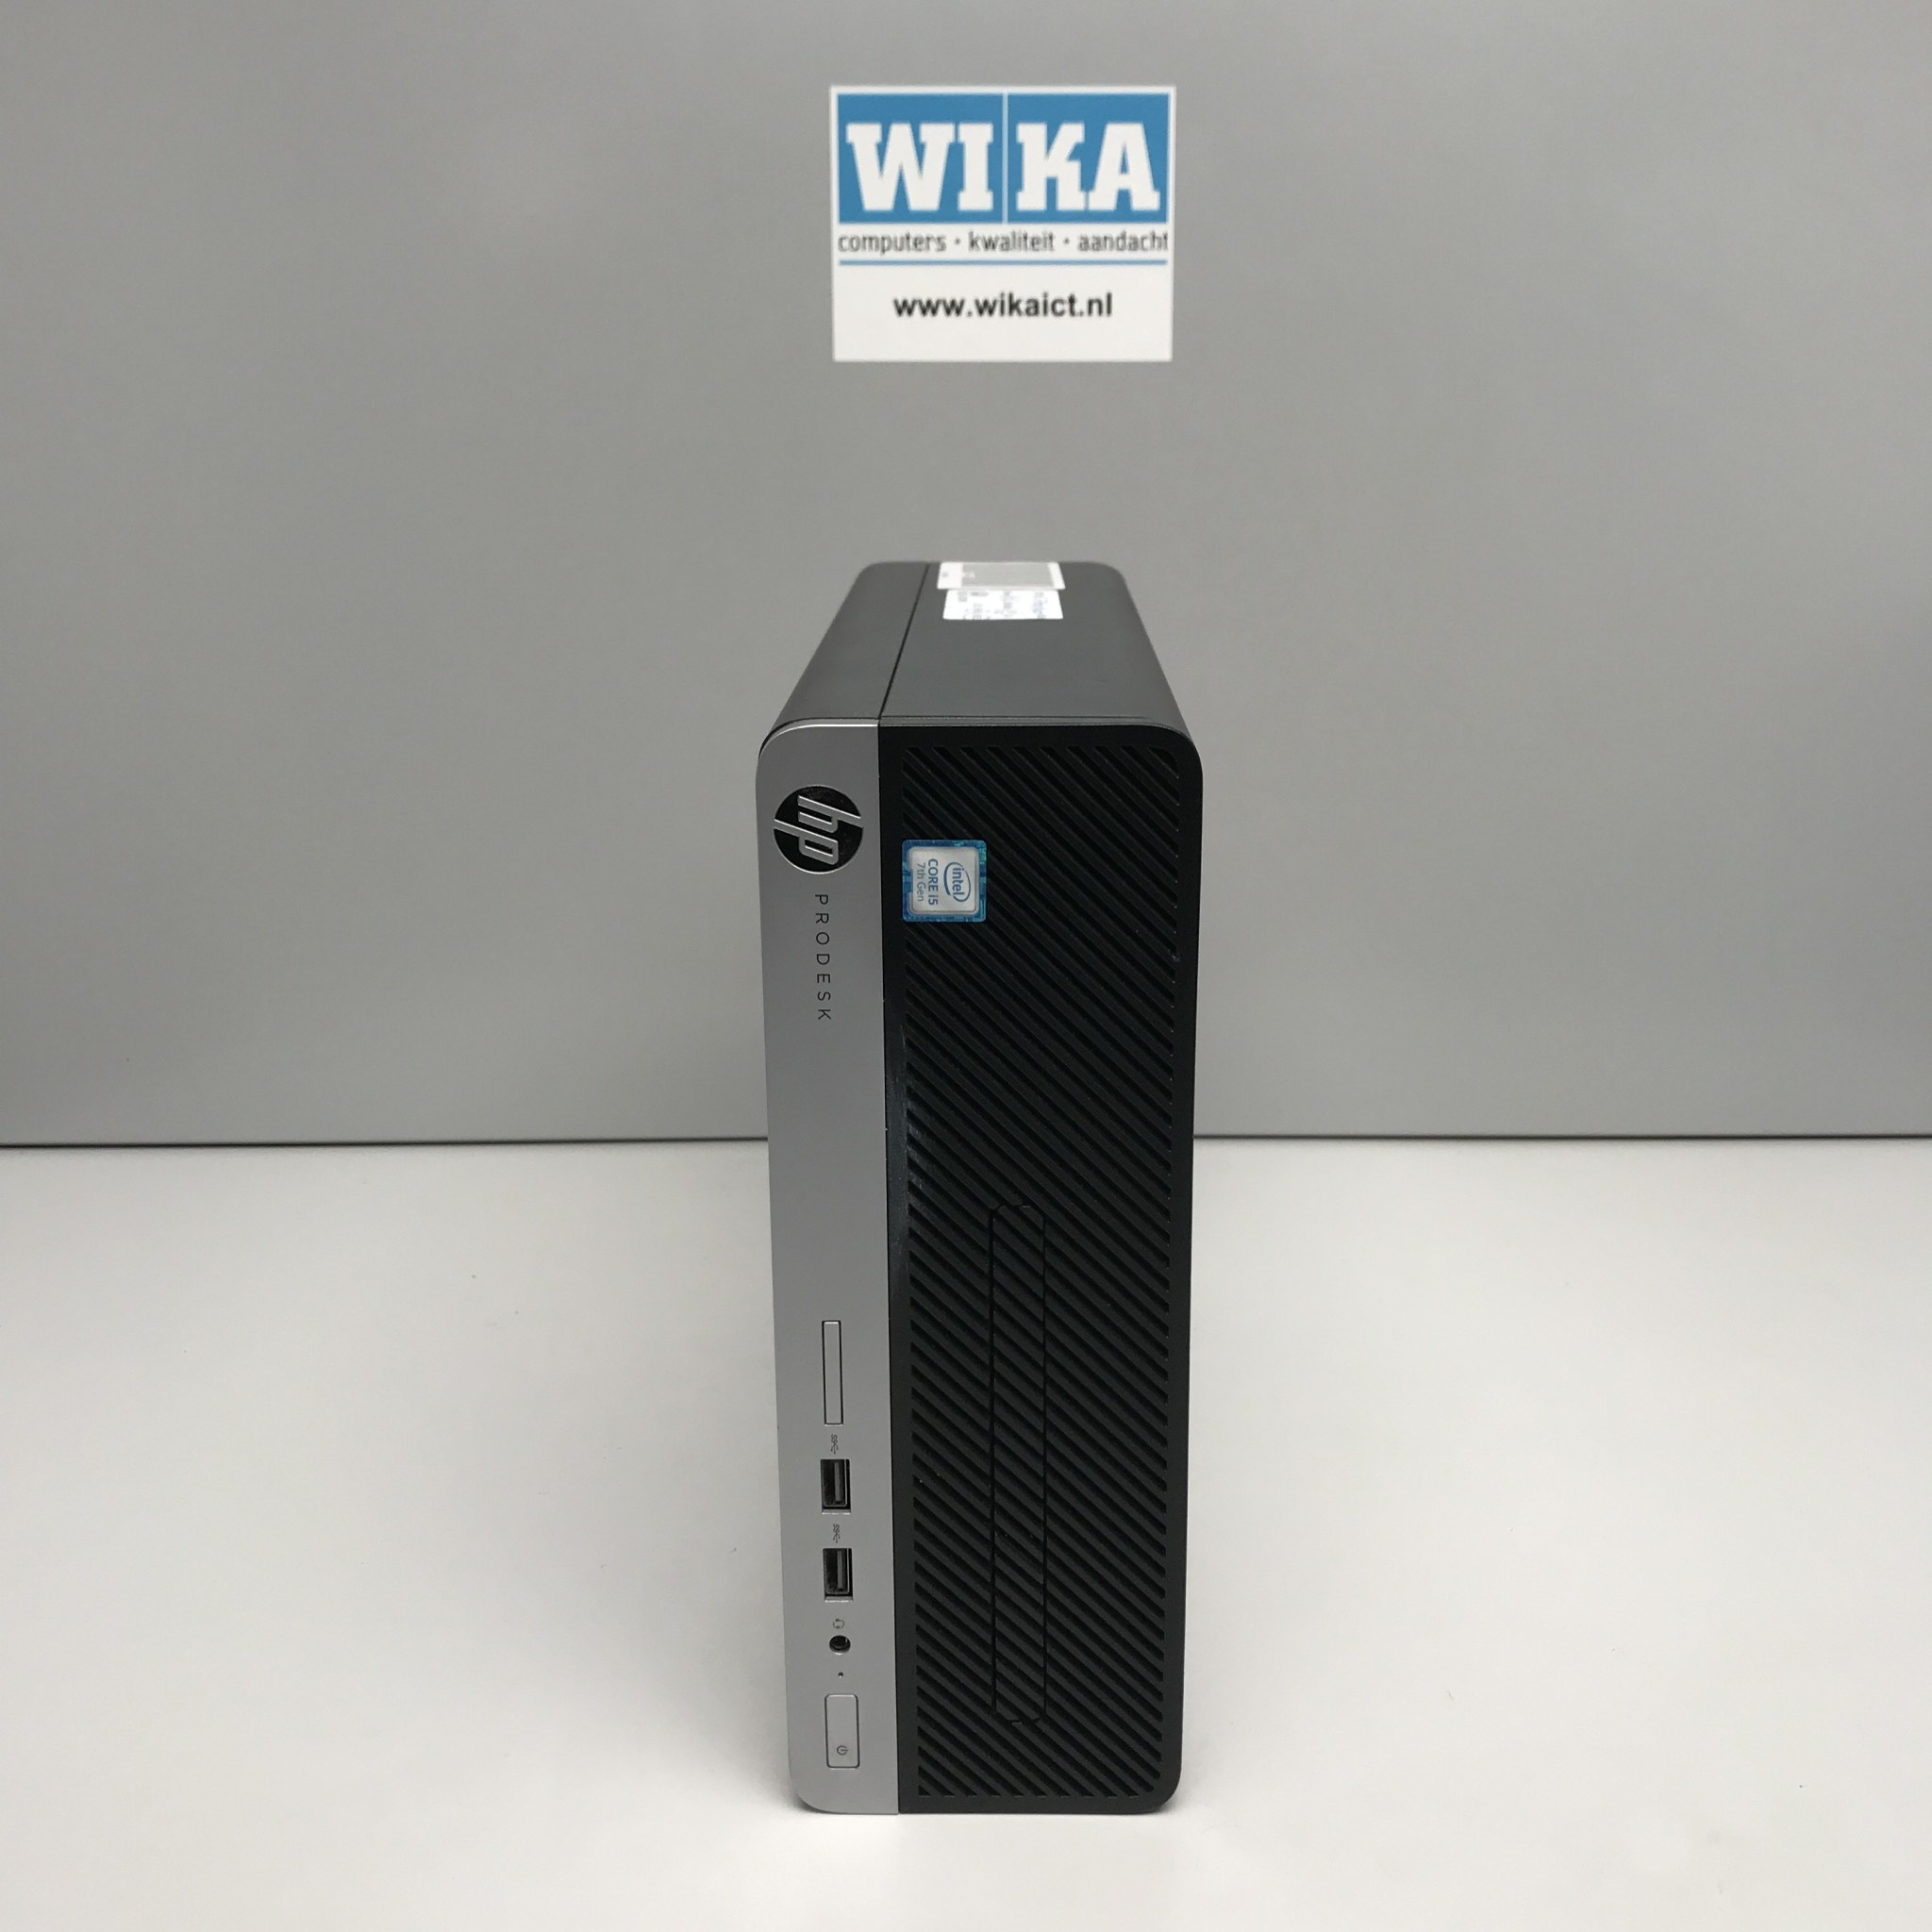 HP Prodesk 400 G6 i5-9500 3Ghz 8Gb 256Gb ssd Windows 10 home